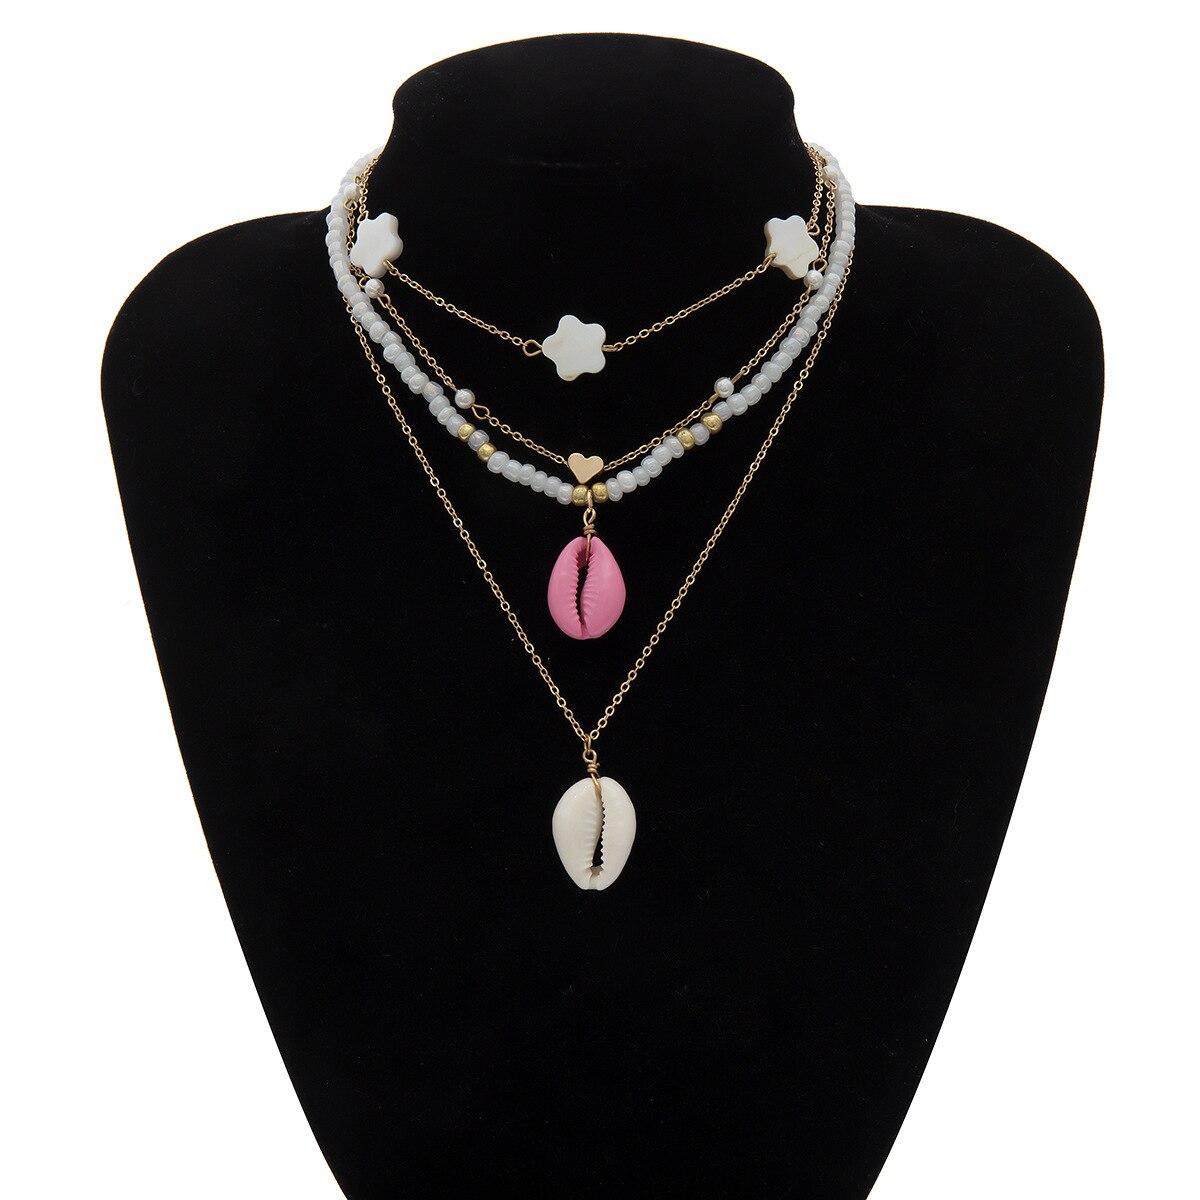 2019 New 2PCS Set Bohemian White Beads Choker Necklace Korean Multi layer Heart Shell Pendant Long Chain Necklace Lover Jewelry in Pendant Necklaces from Jewelry Accessories